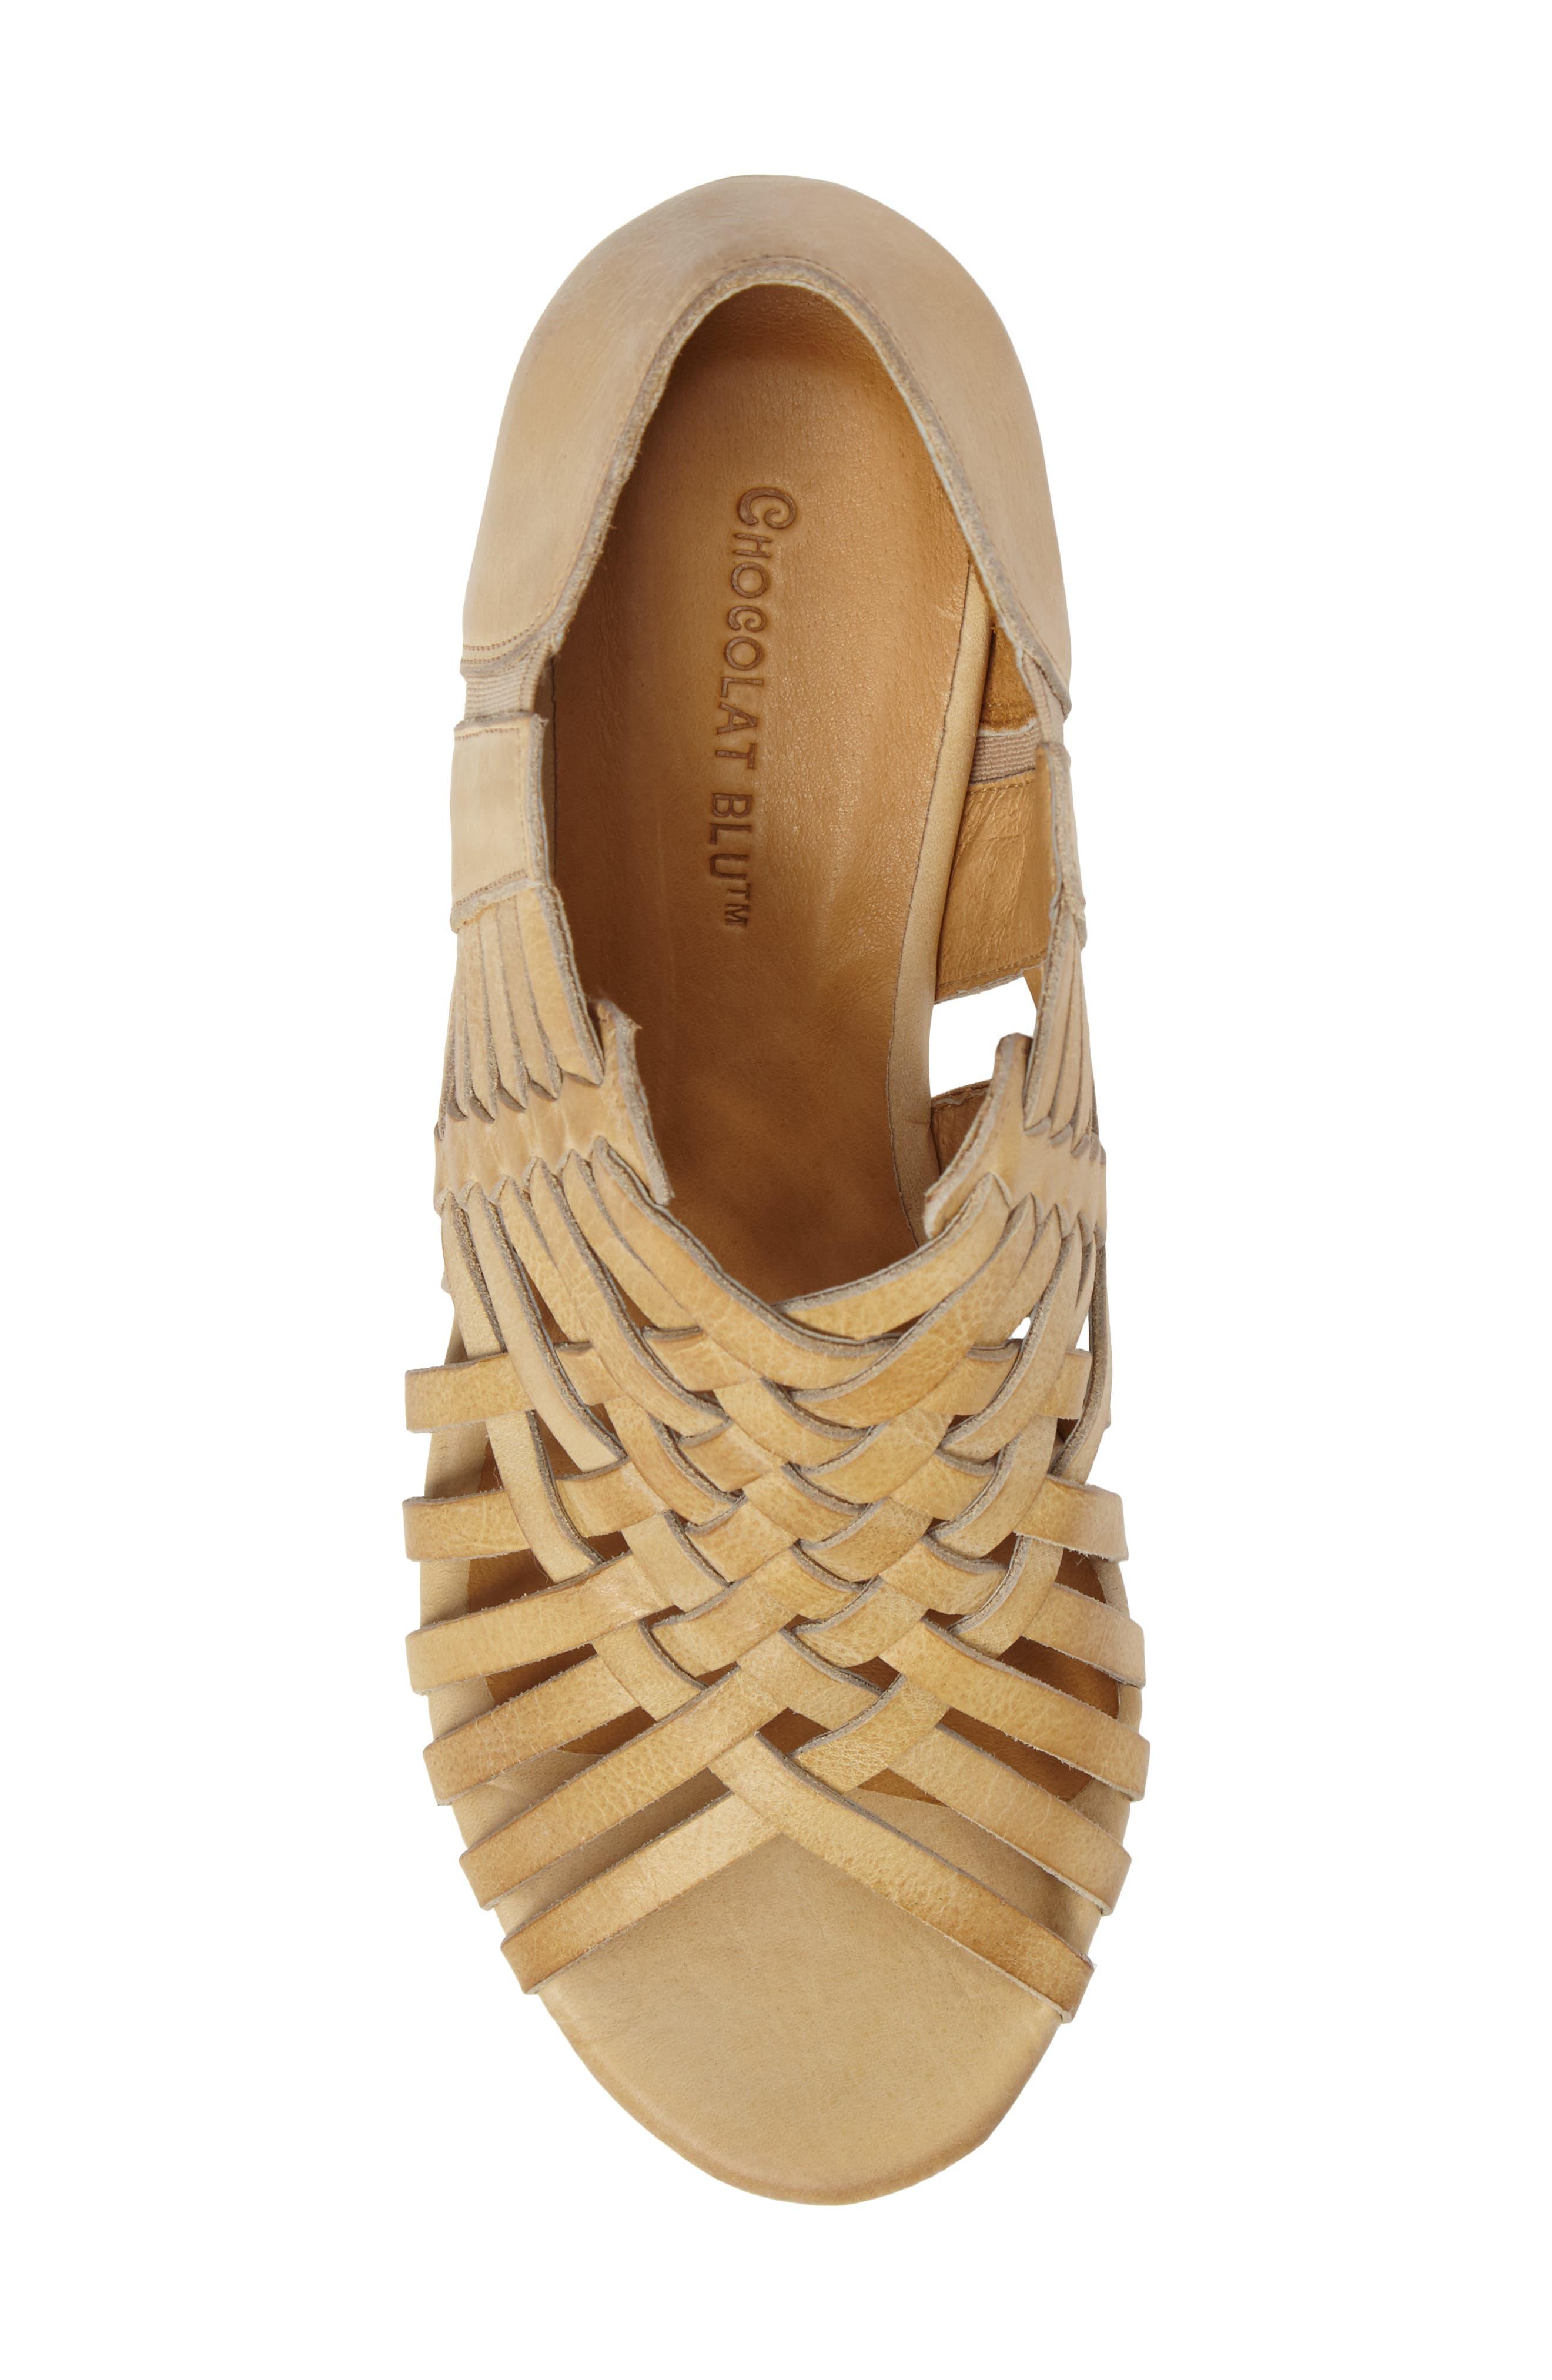 Vic Platform Sandal,                             Alternate thumbnail 4, color,                             Natural Leather